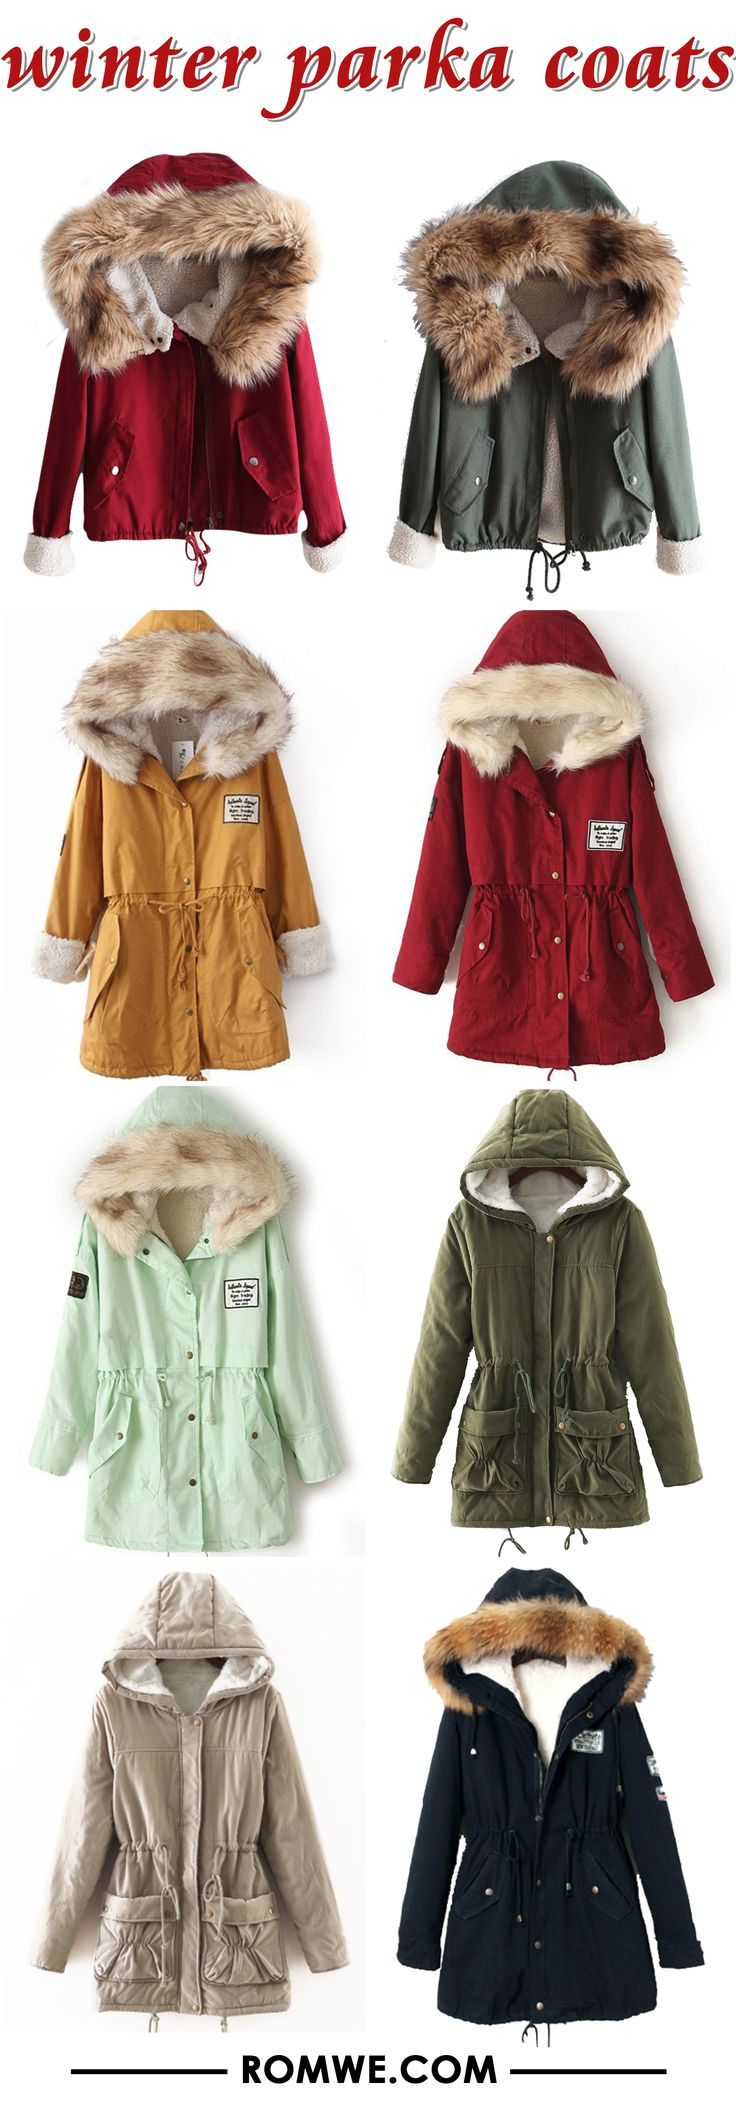 black friday sale - winter warm parka coats from romwe.com